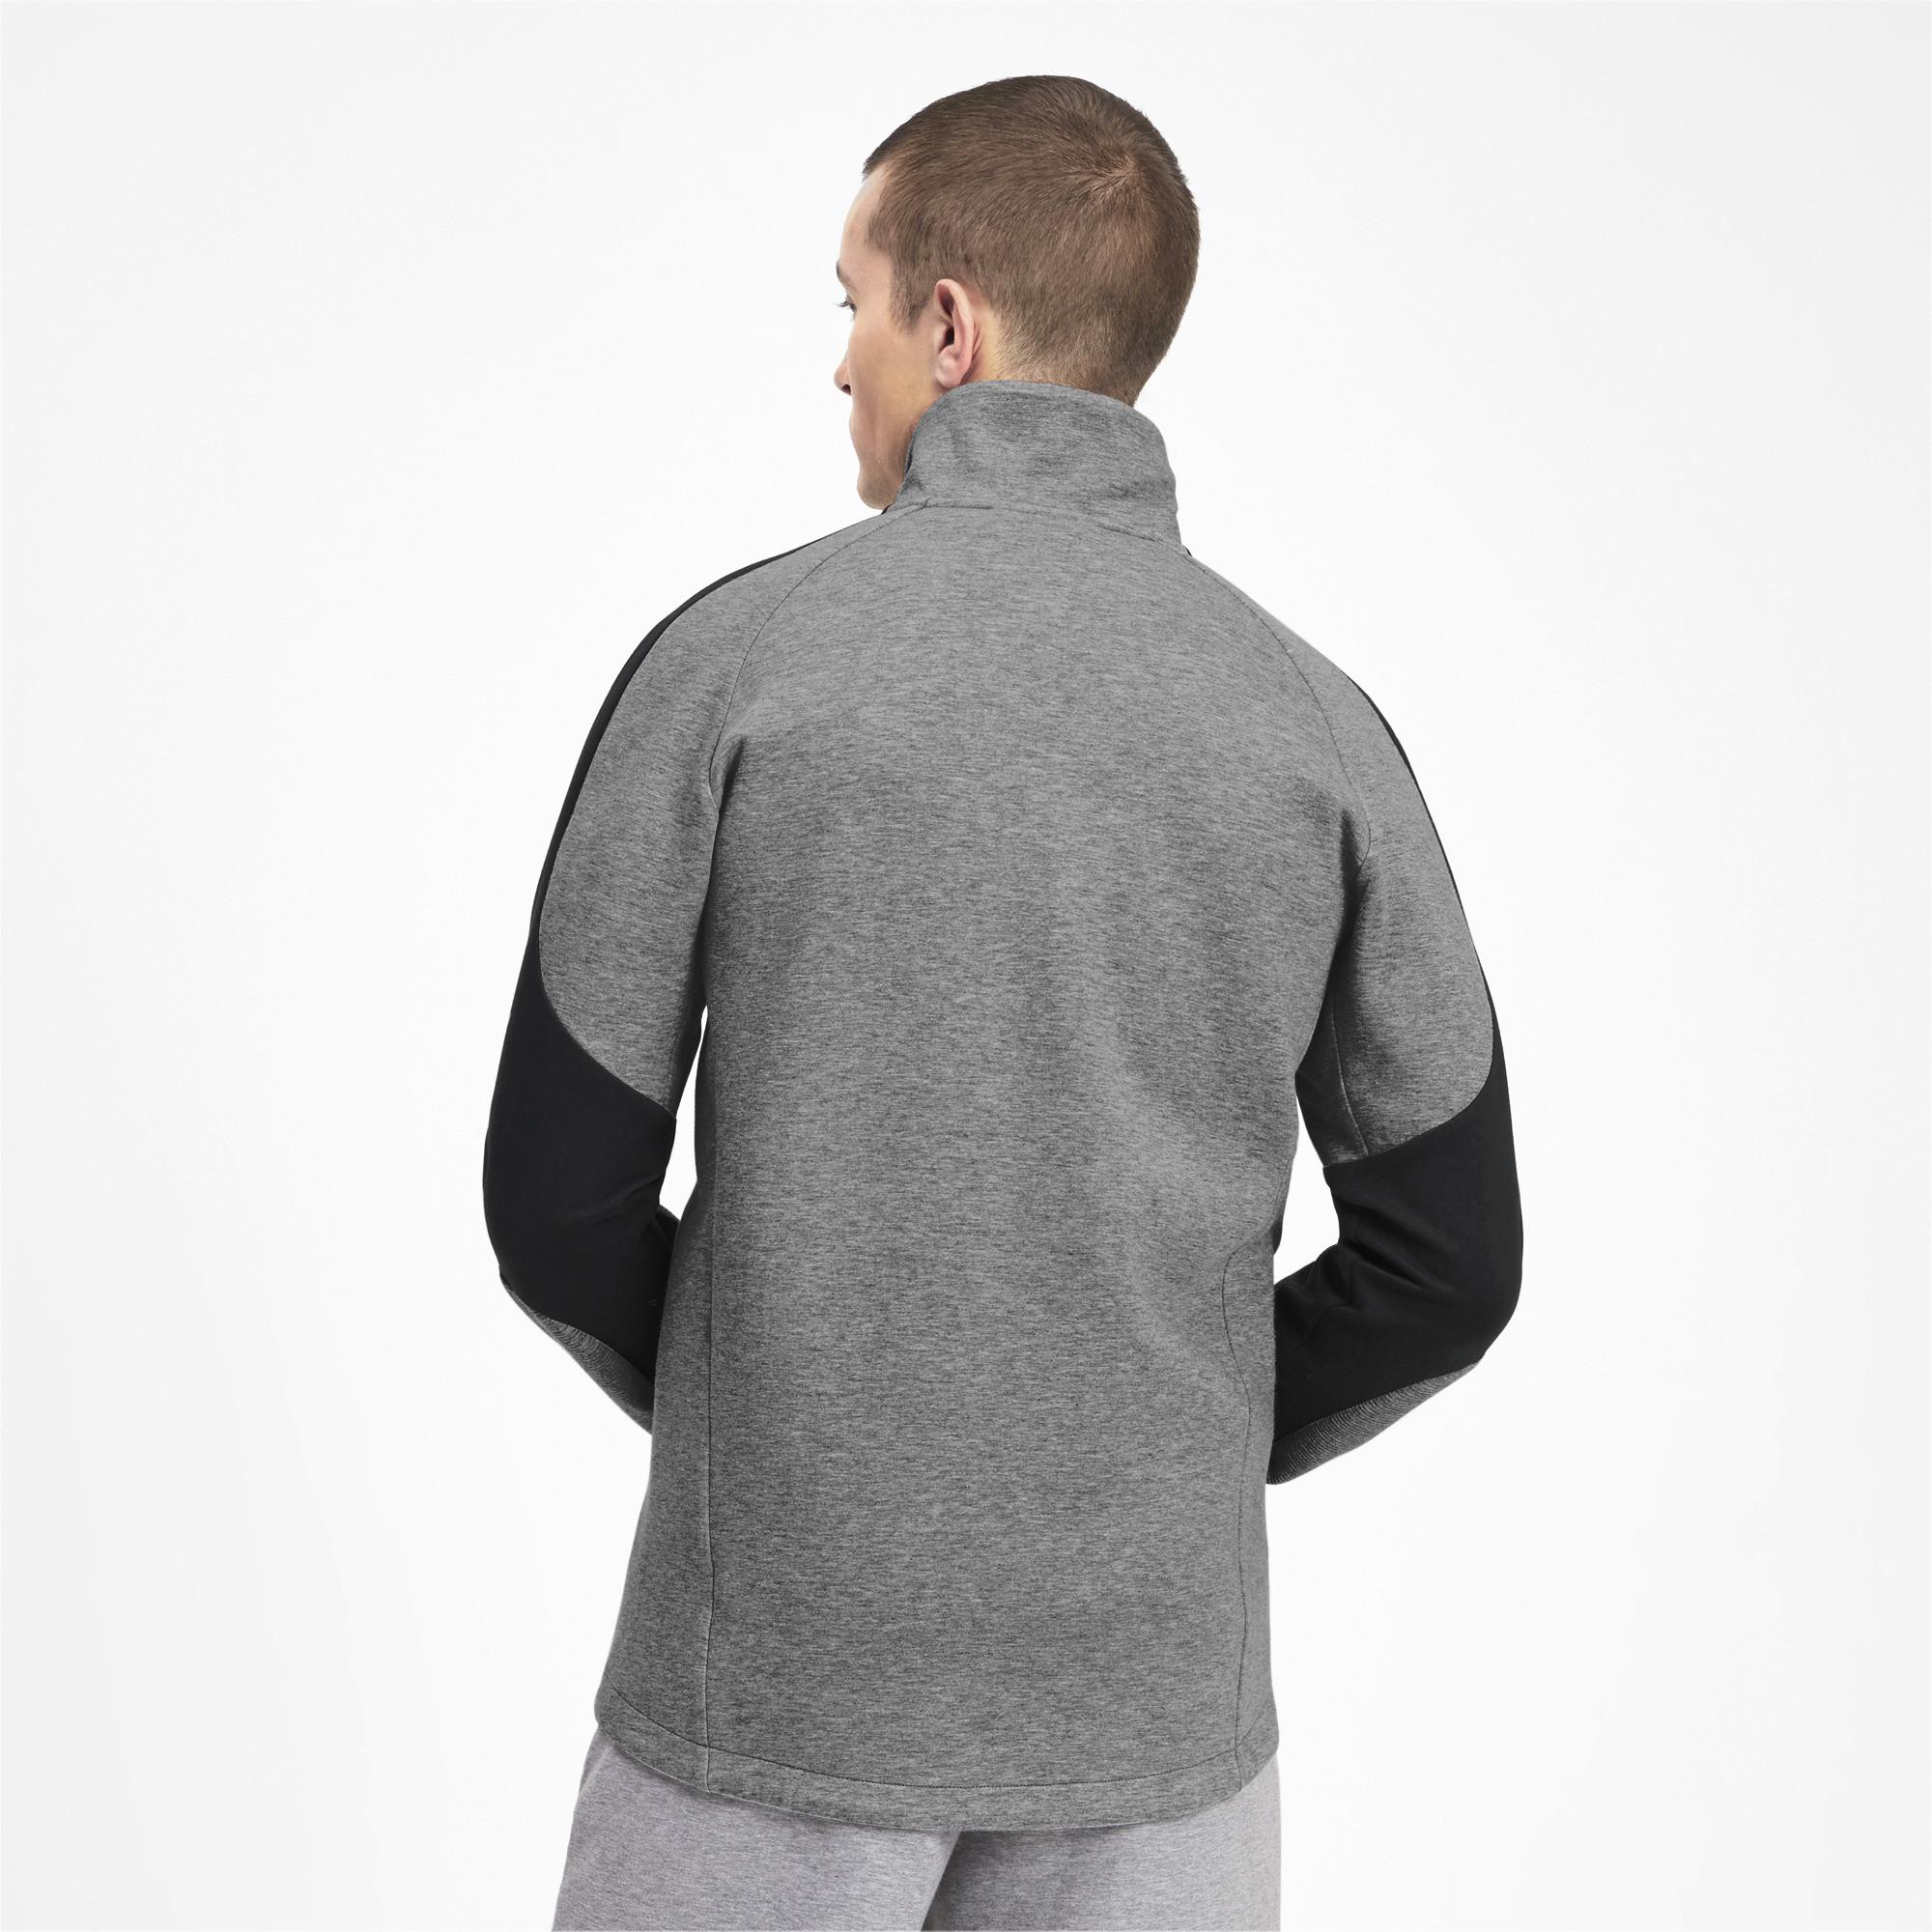 PUMA-Evostripe-Men-039-s-Jacket-Men-Sweat-Basics thumbnail 10